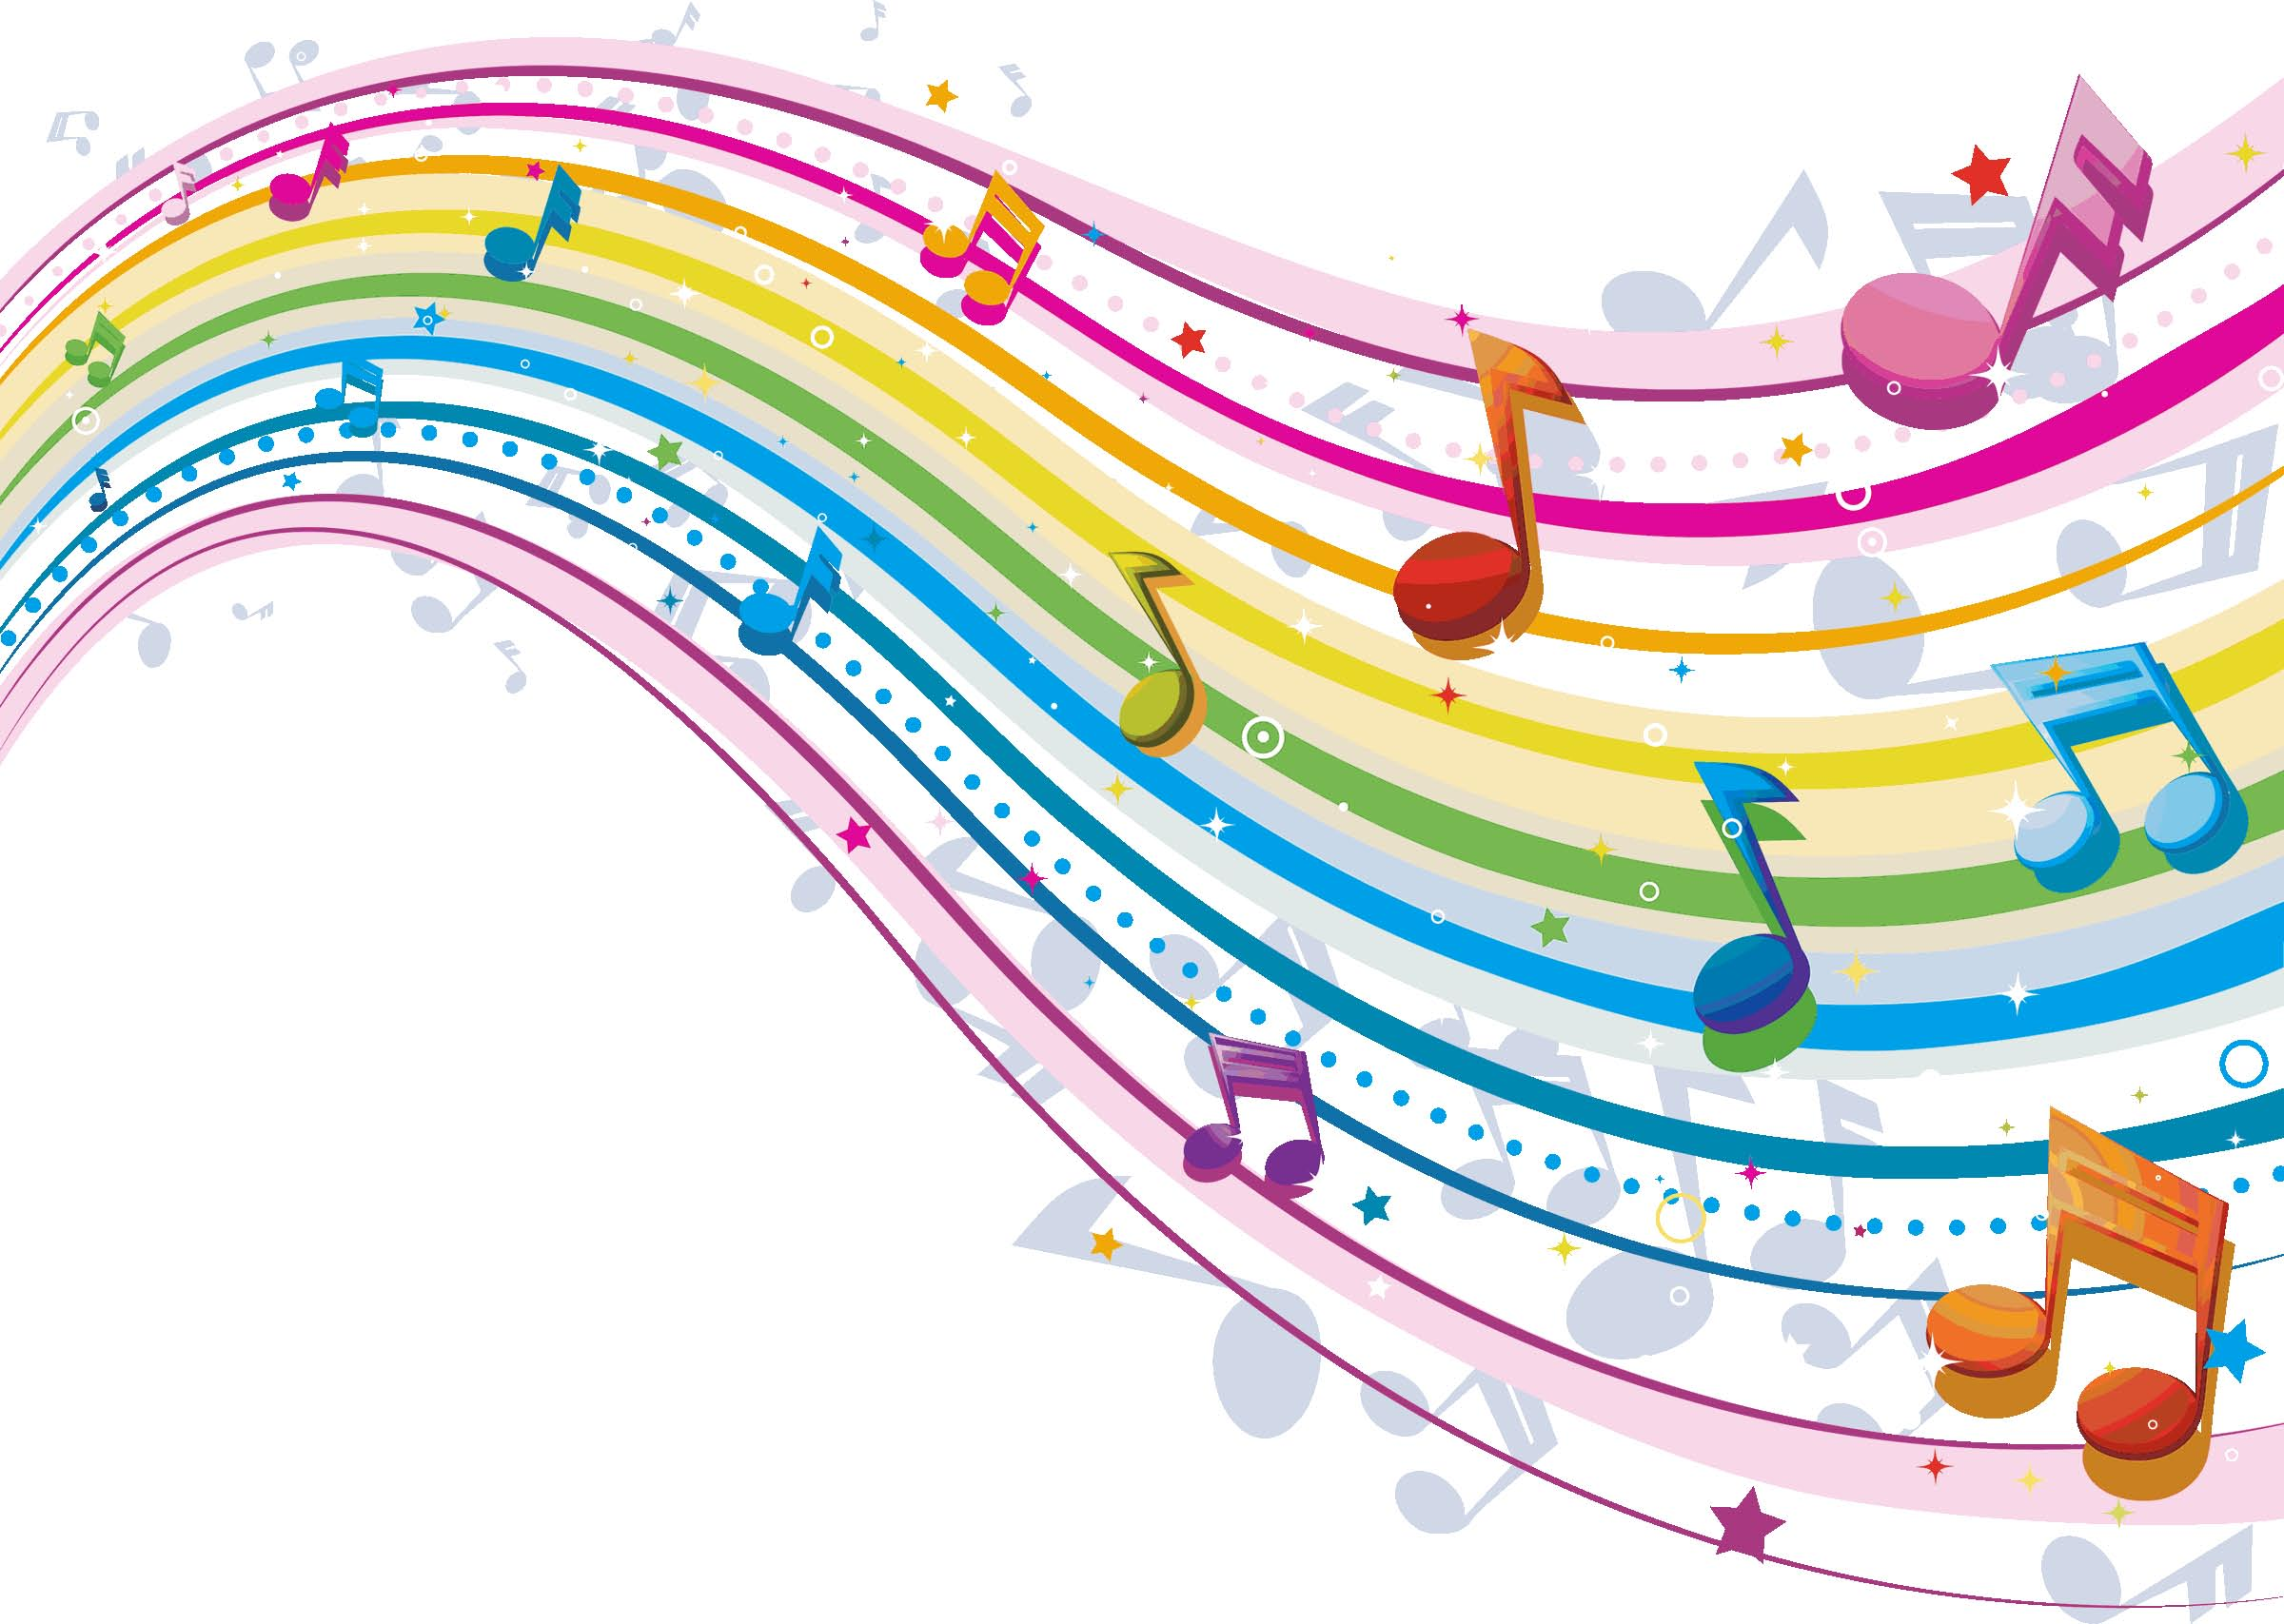 [43+] Colorful Music Notes Wallpaper on WallpaperSafari